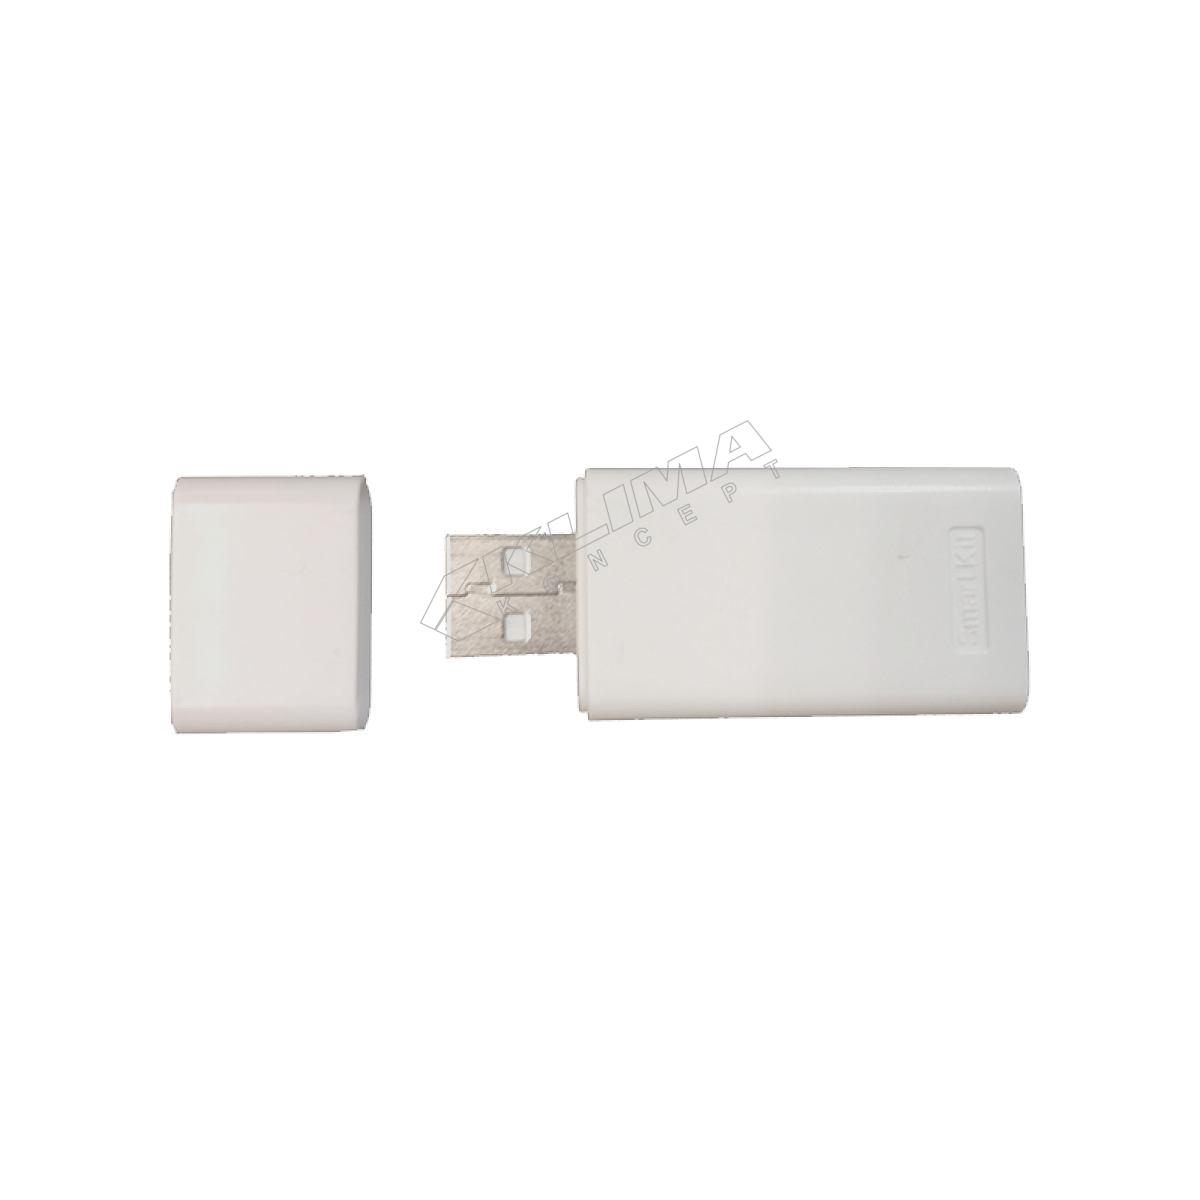 KOREL WiFi adapter